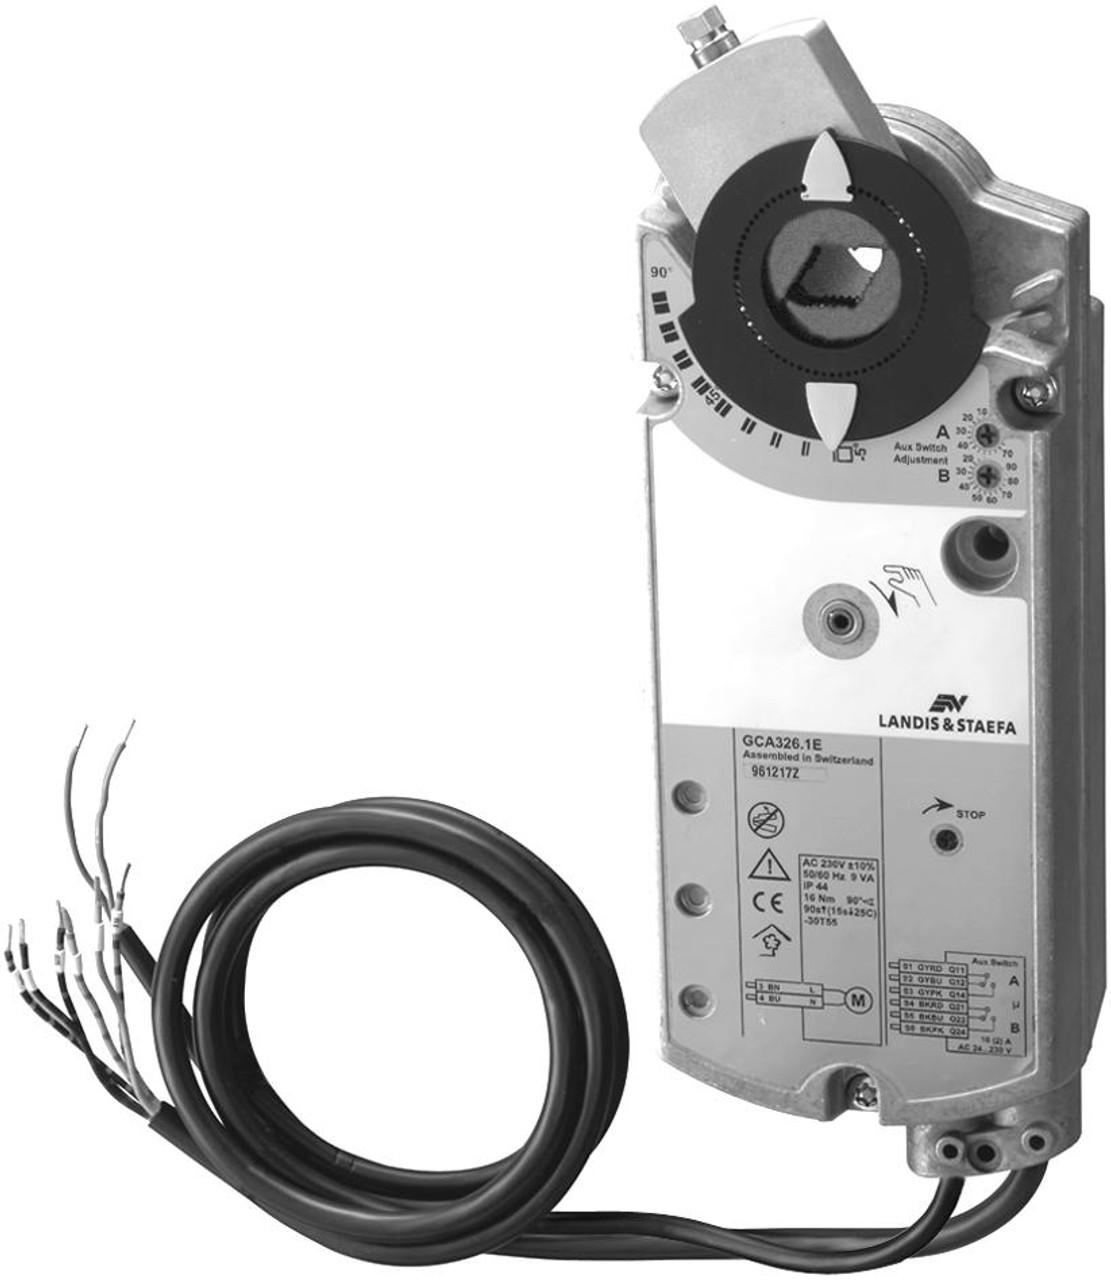 GCA121.1E rotary air damper actuator